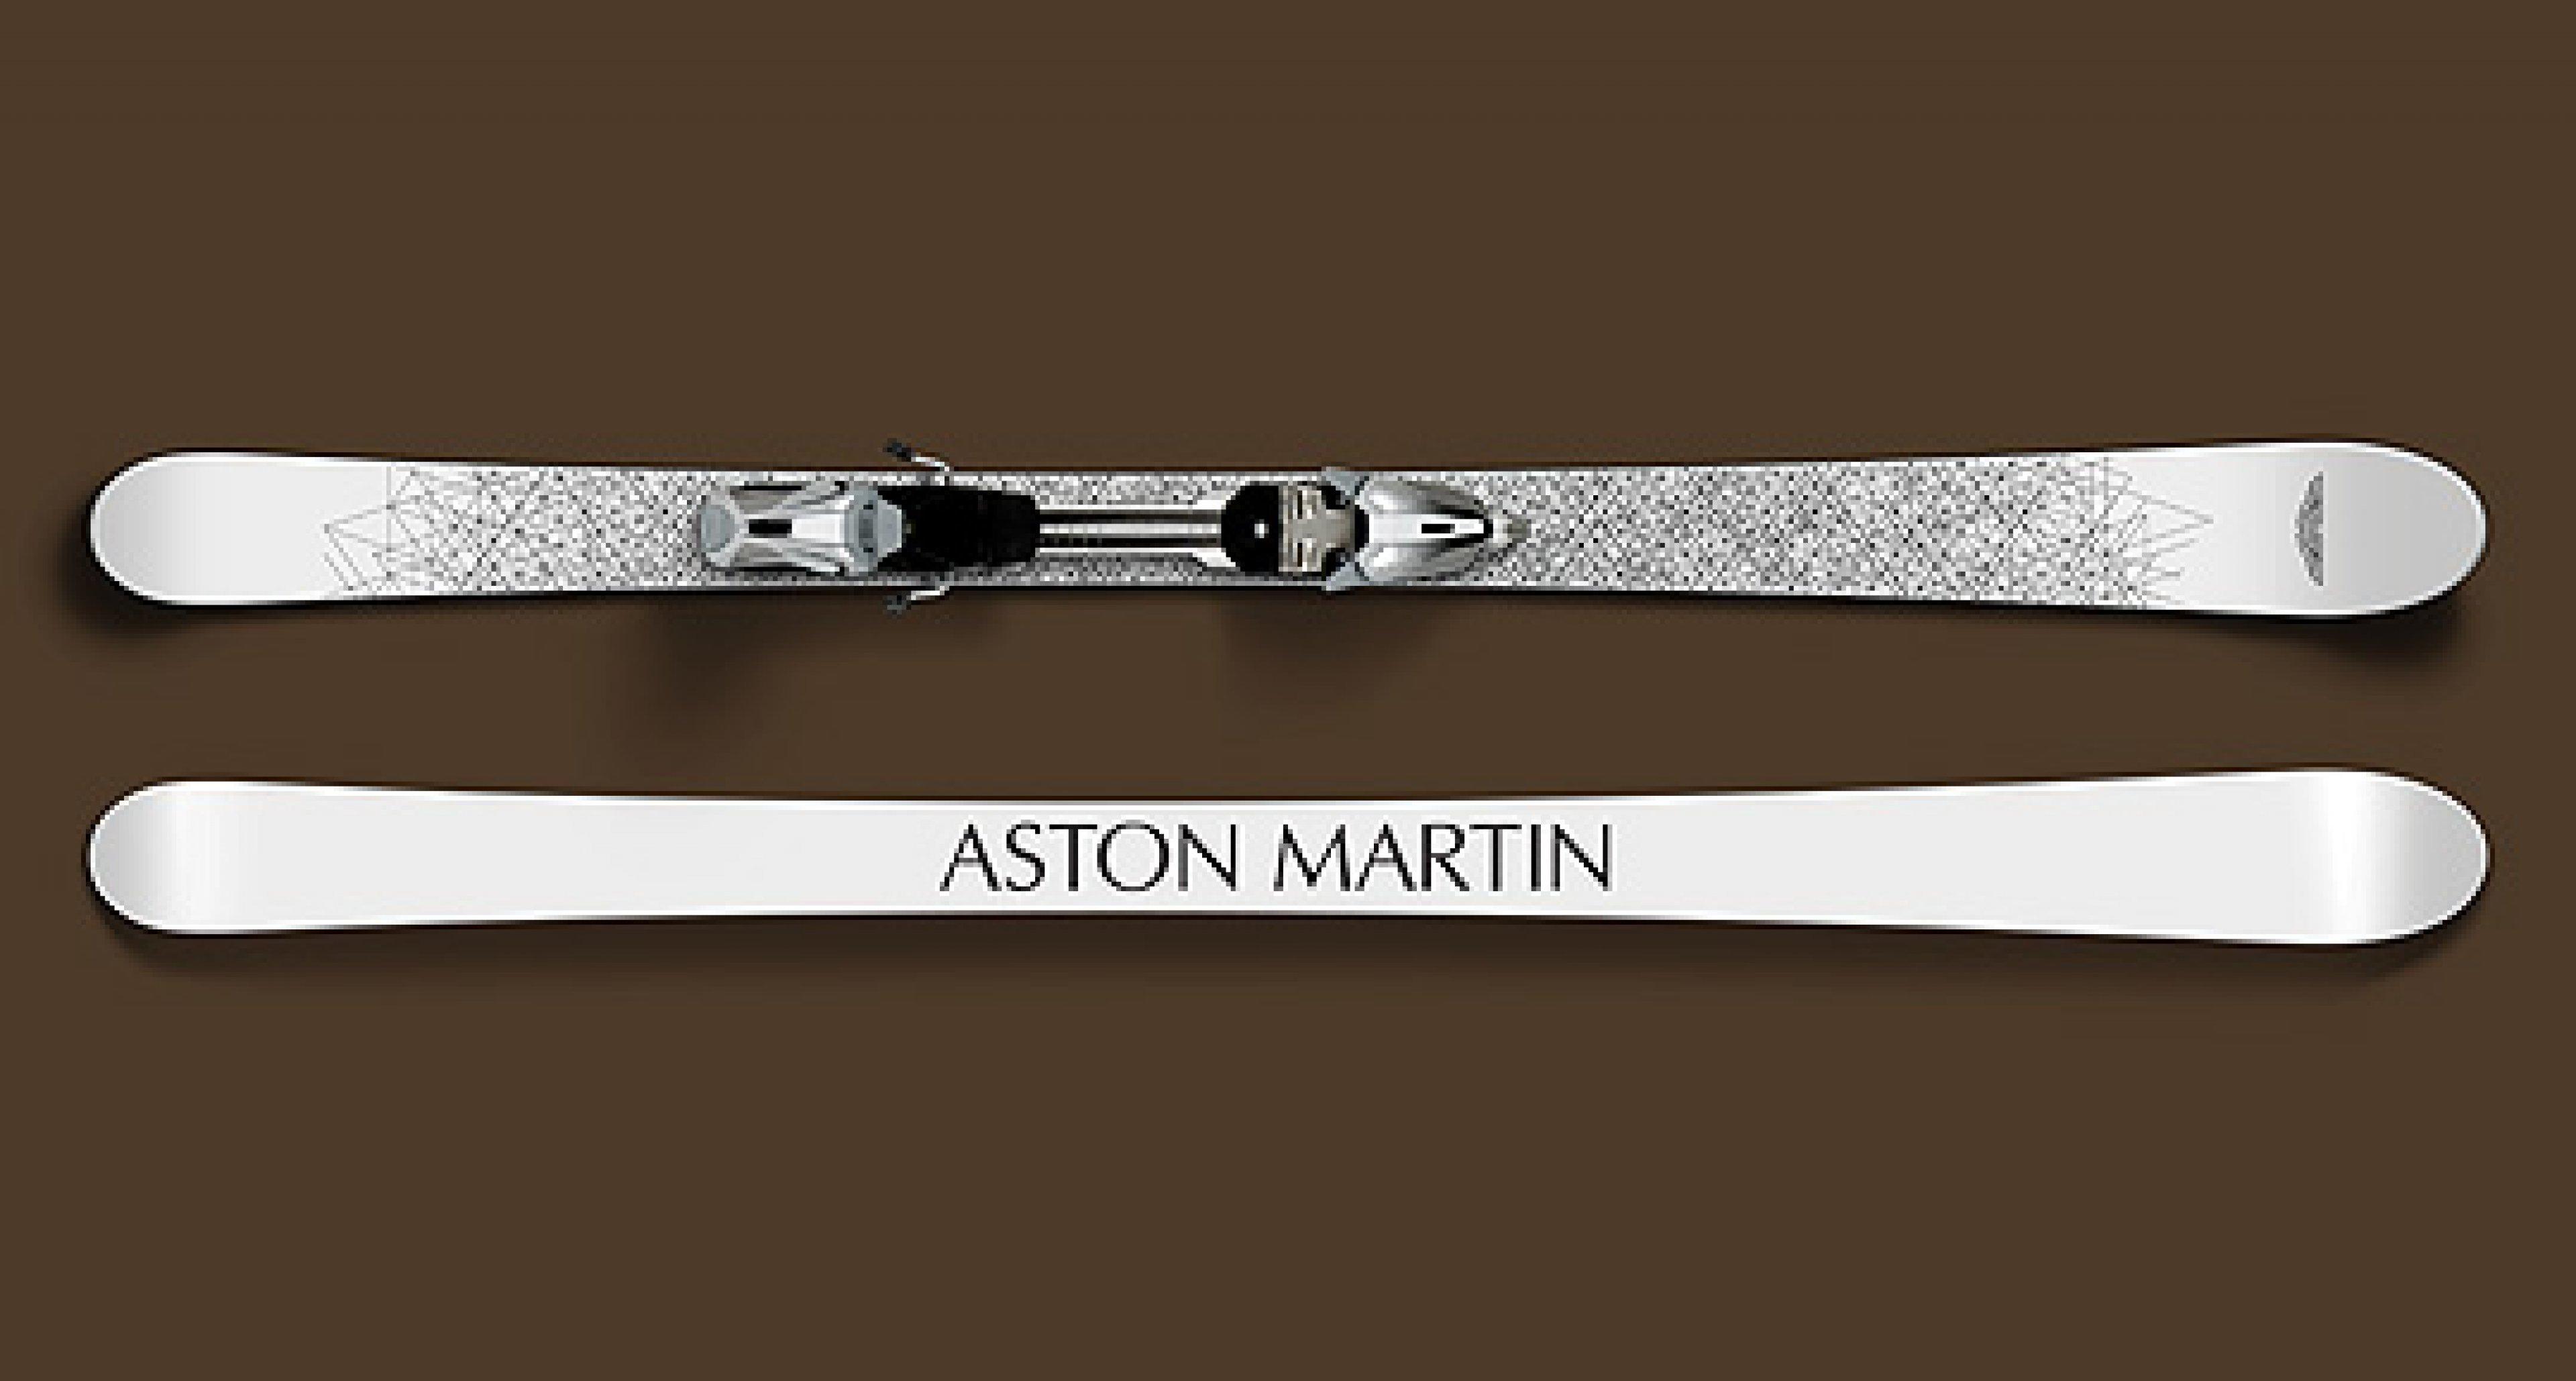 Aston Martin Skis: Morning Frost